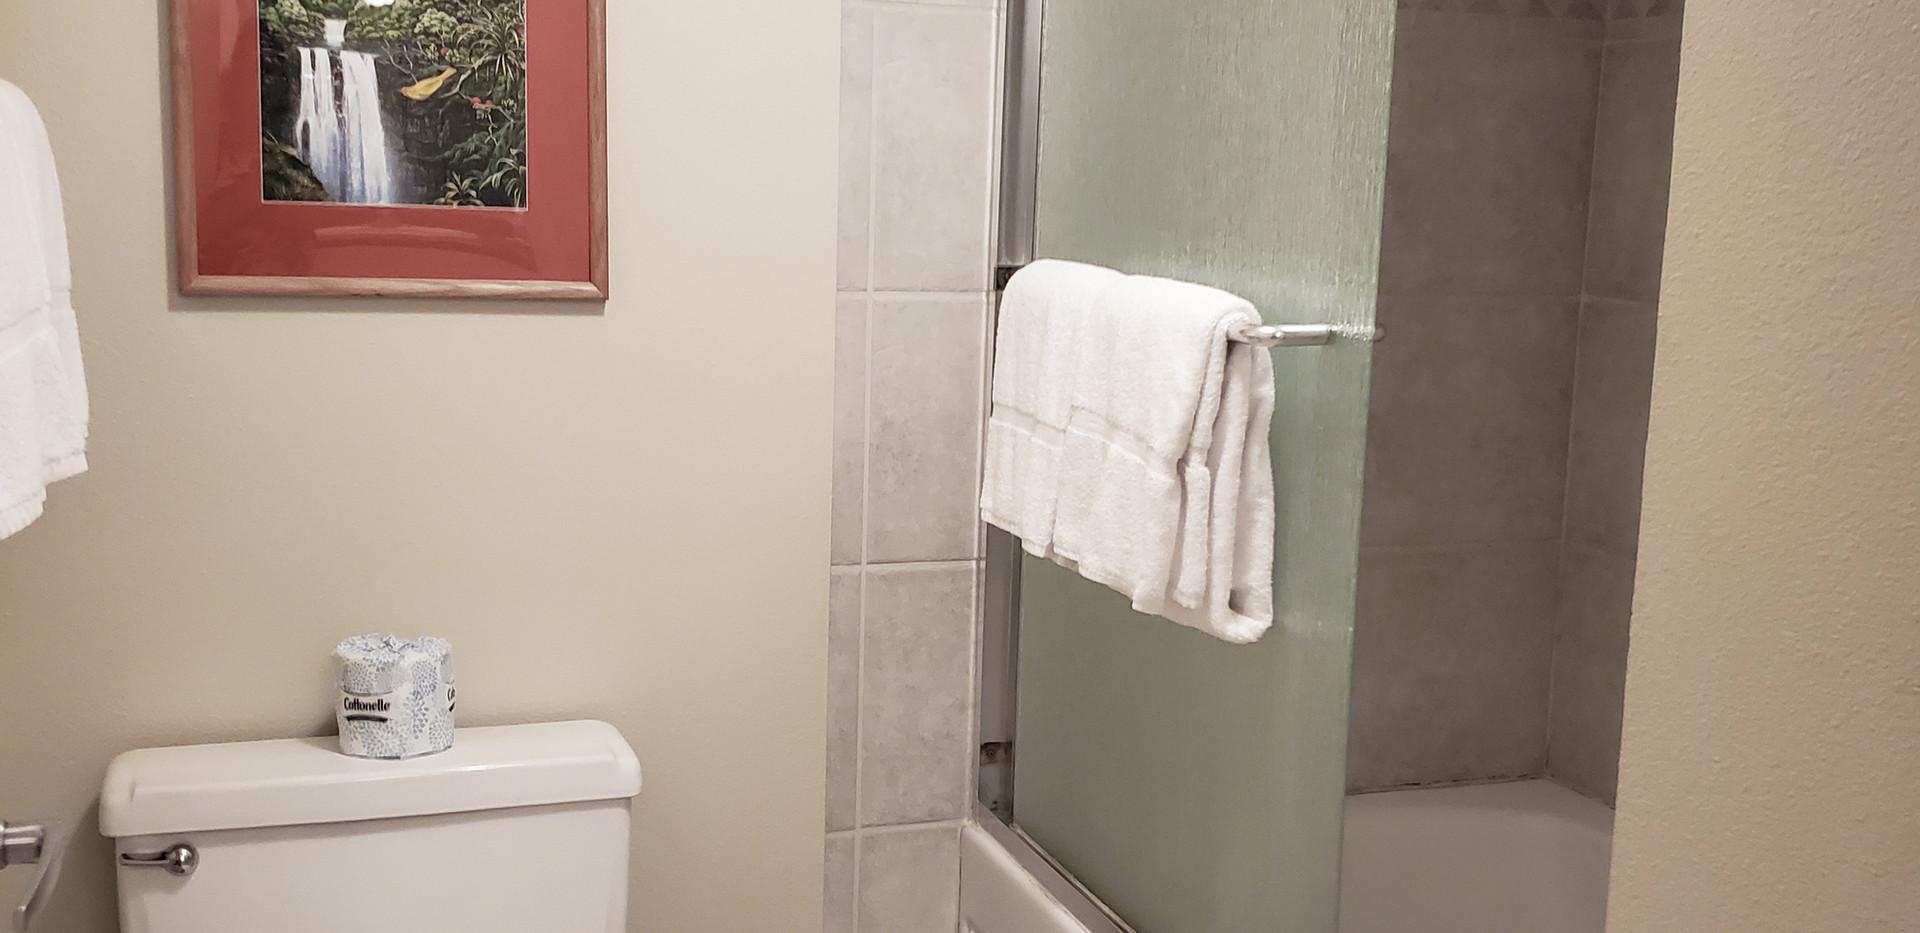 Tub/Shower Before